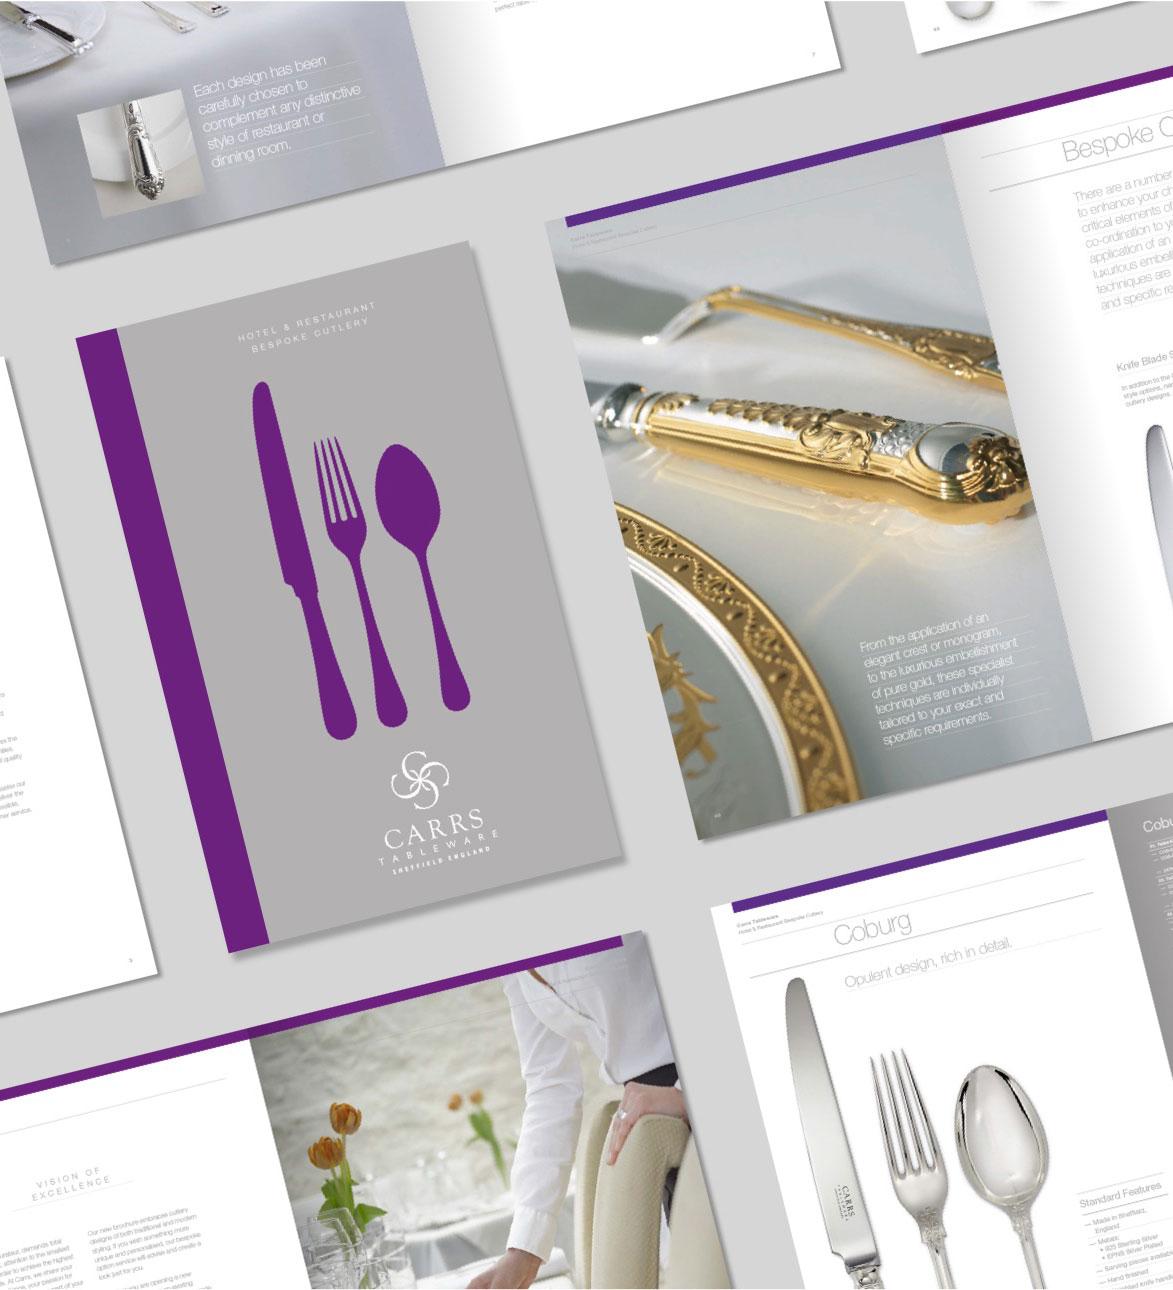 Carrs Silver brochure mockups